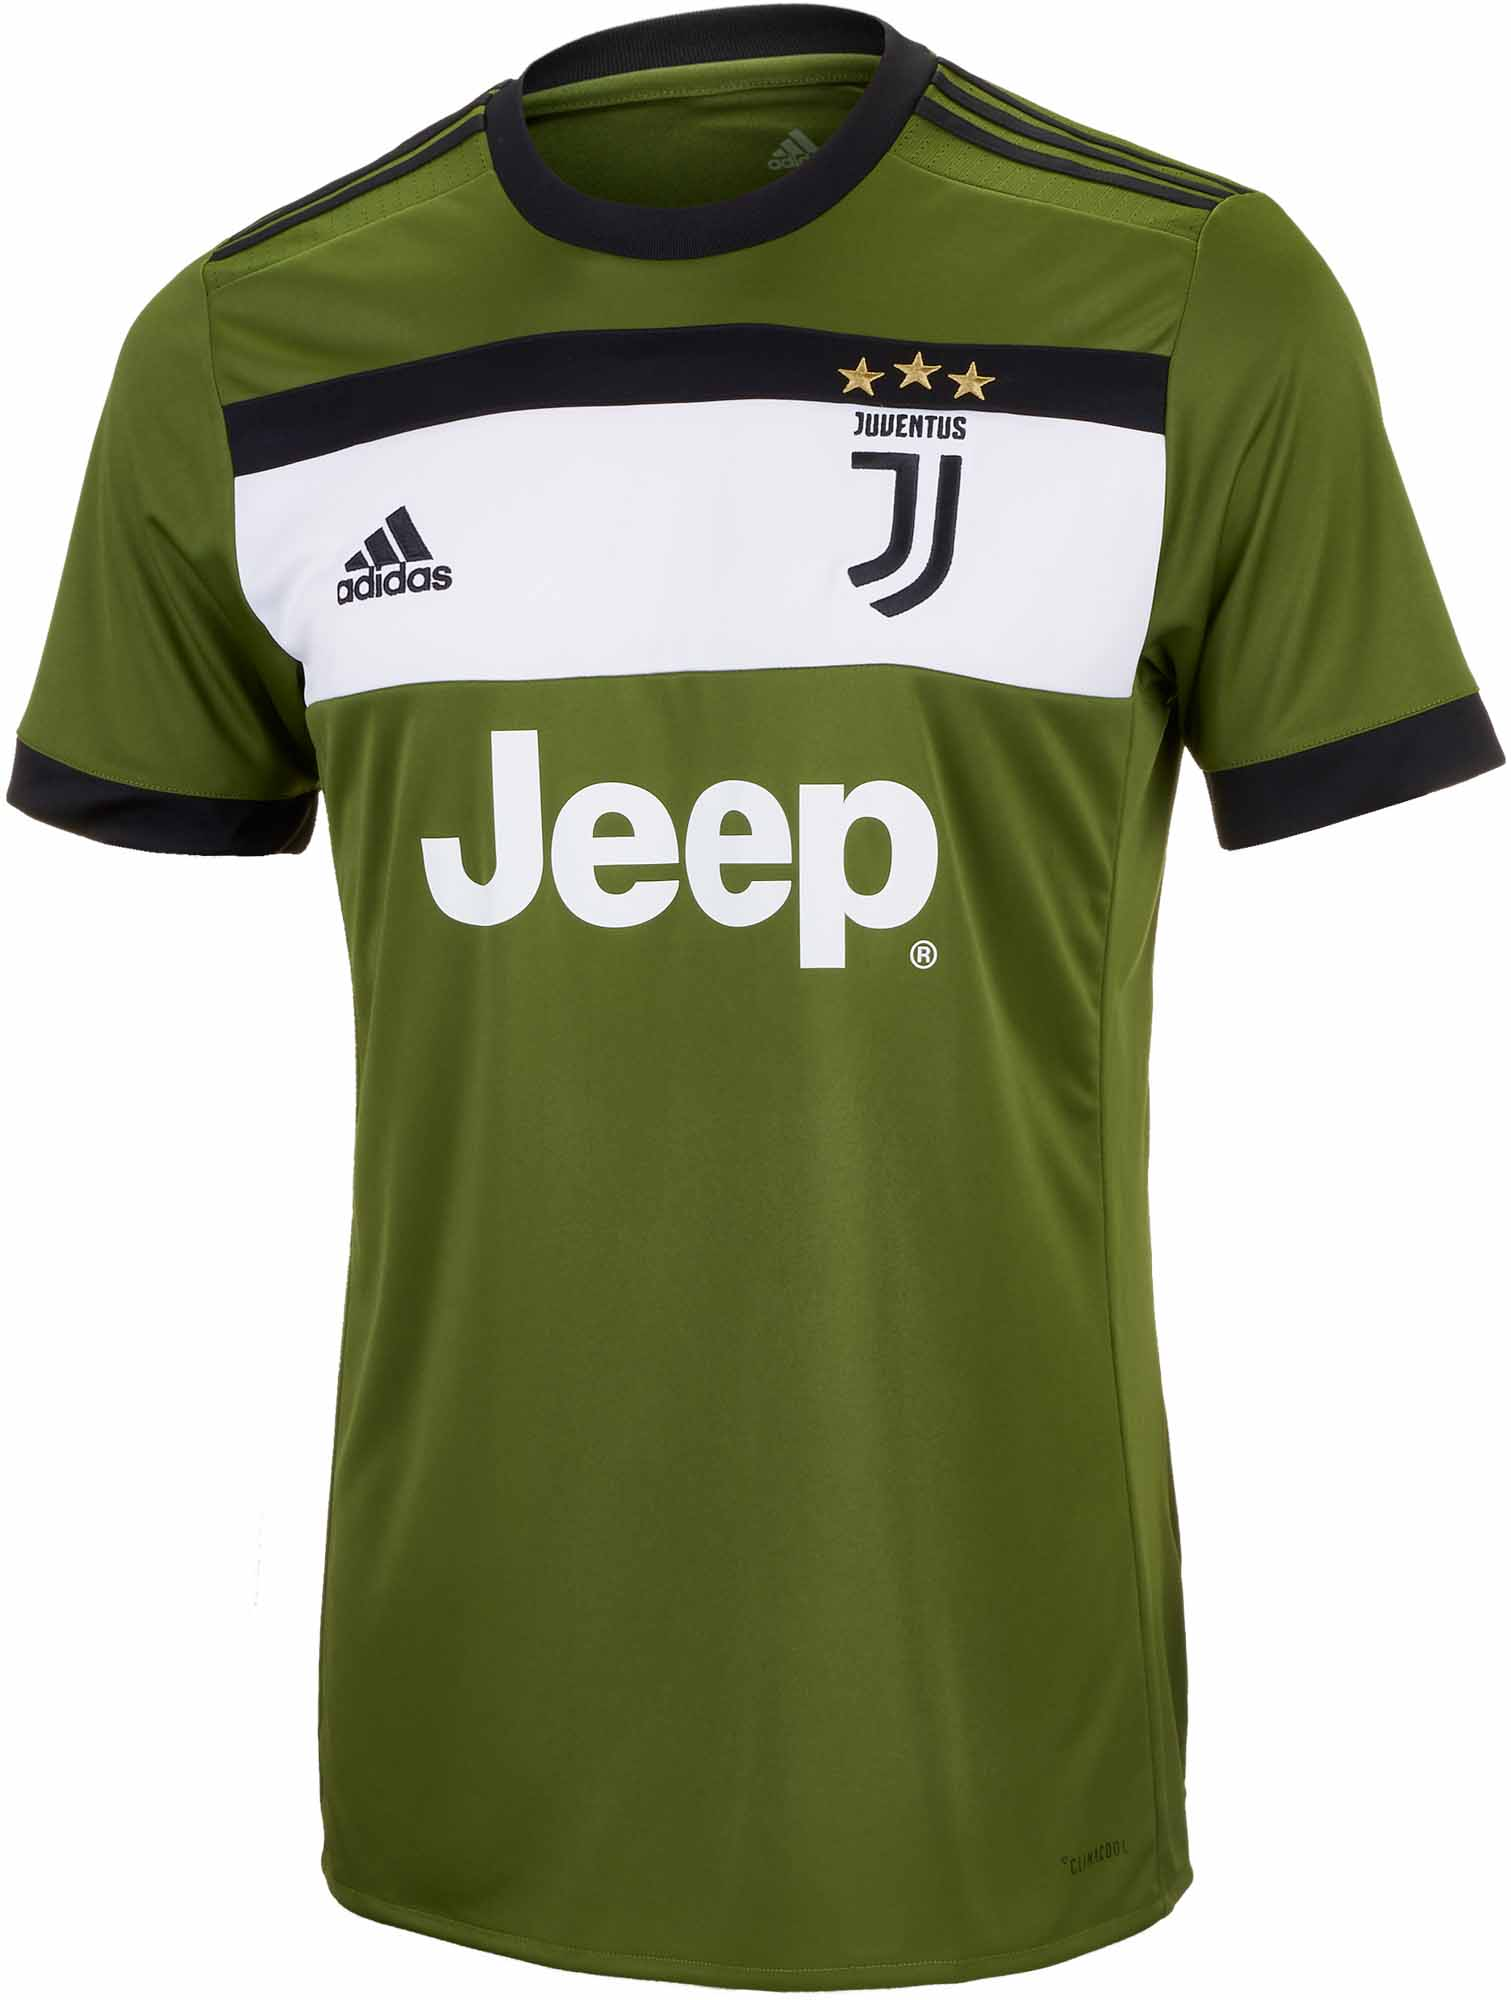 6dcdd5f67 2017 18 adidas Juventus 3rd Jersey - Juventus Jerseys